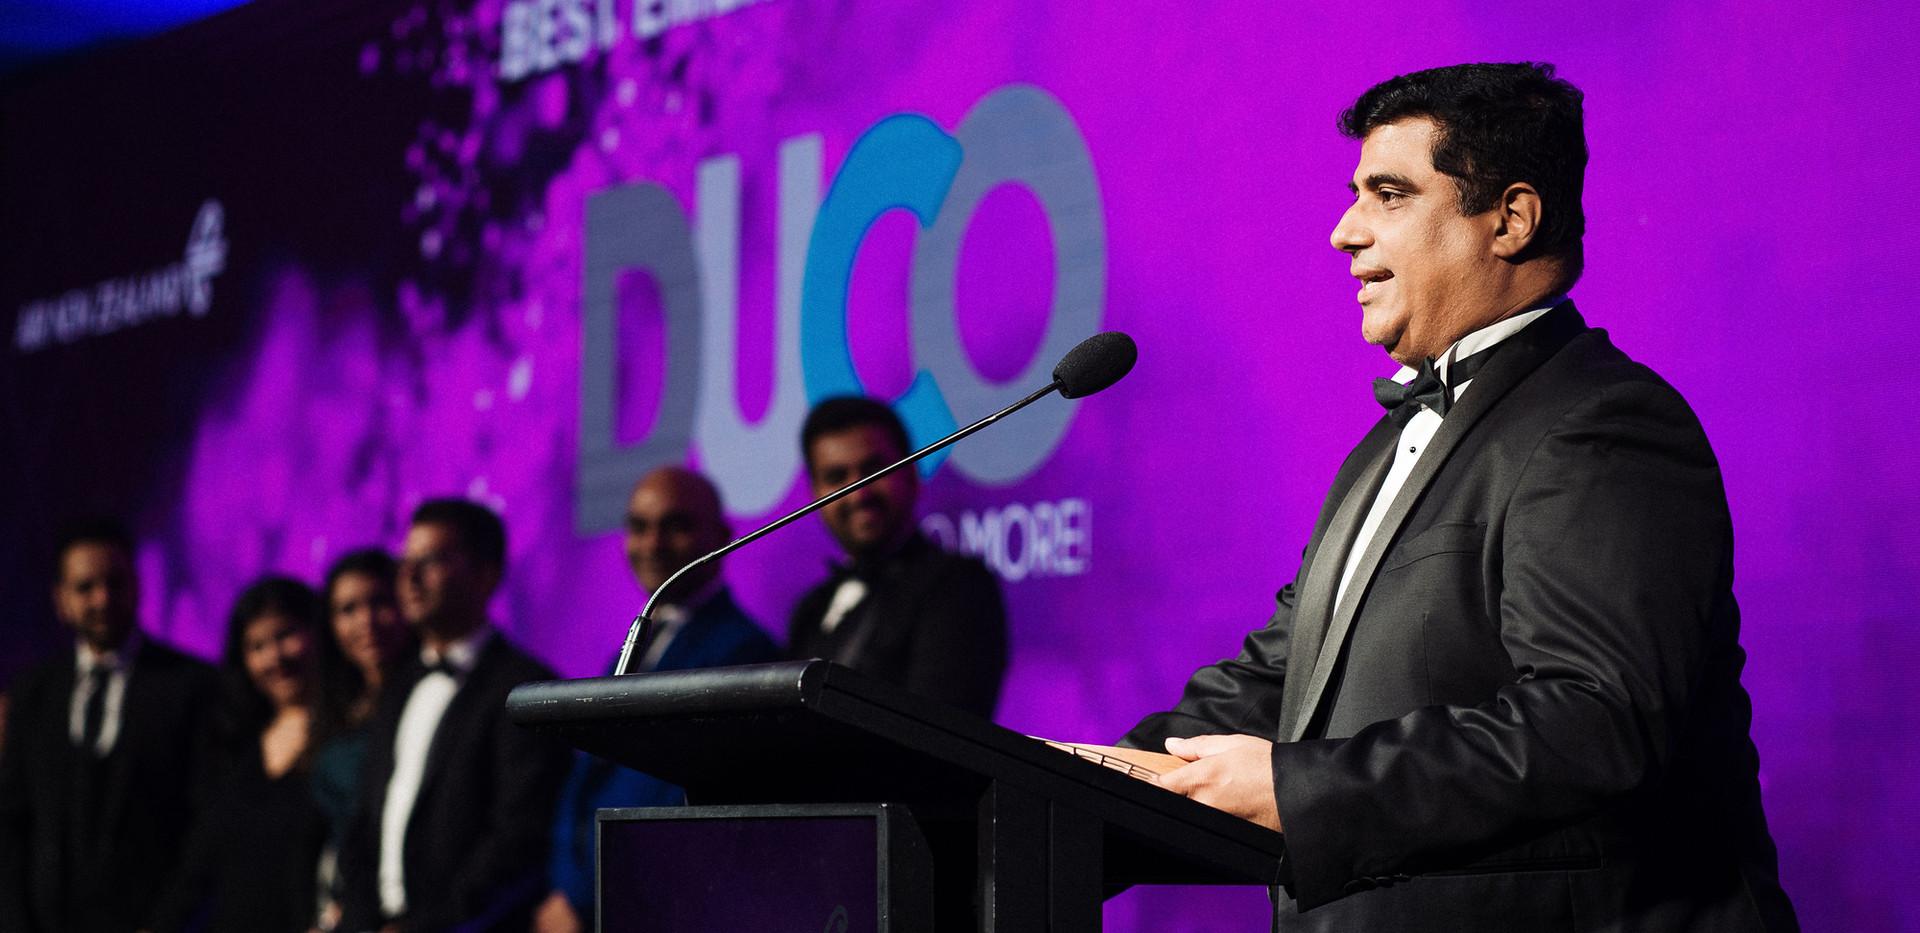 Chandan Ohri's speech at the westpac awards 2020